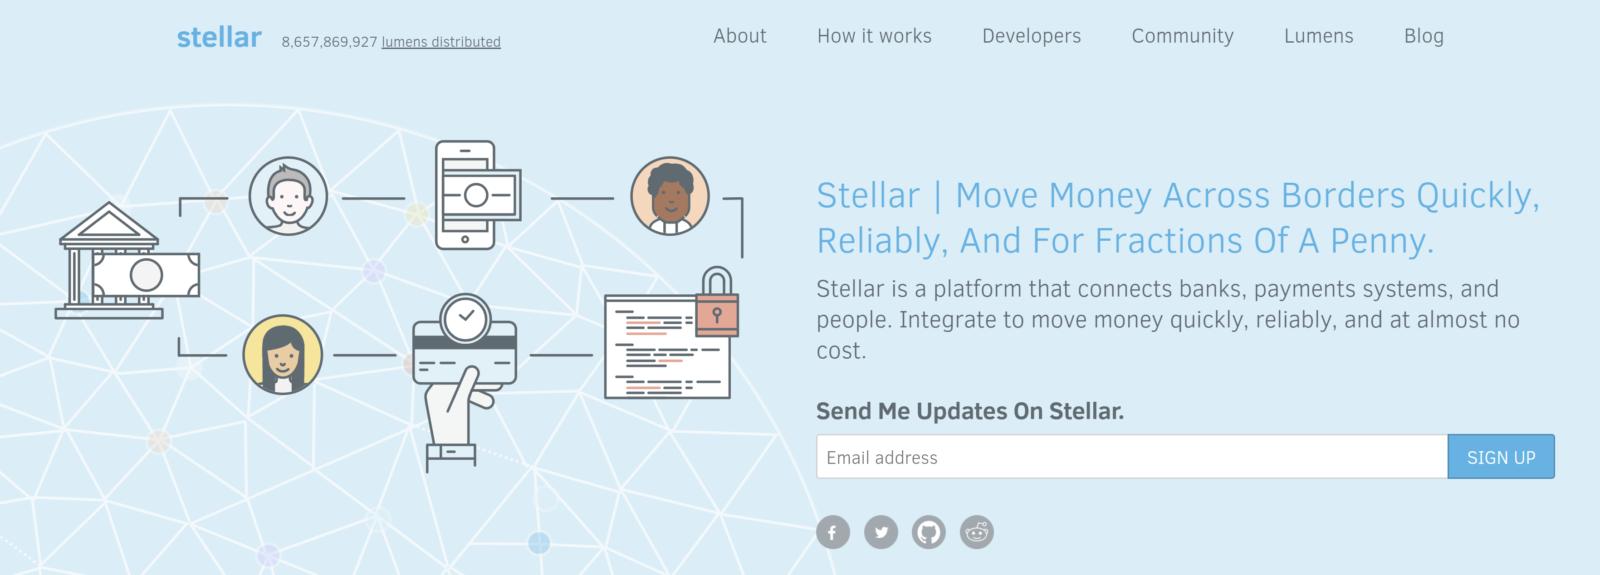 Stellar lumens homepage